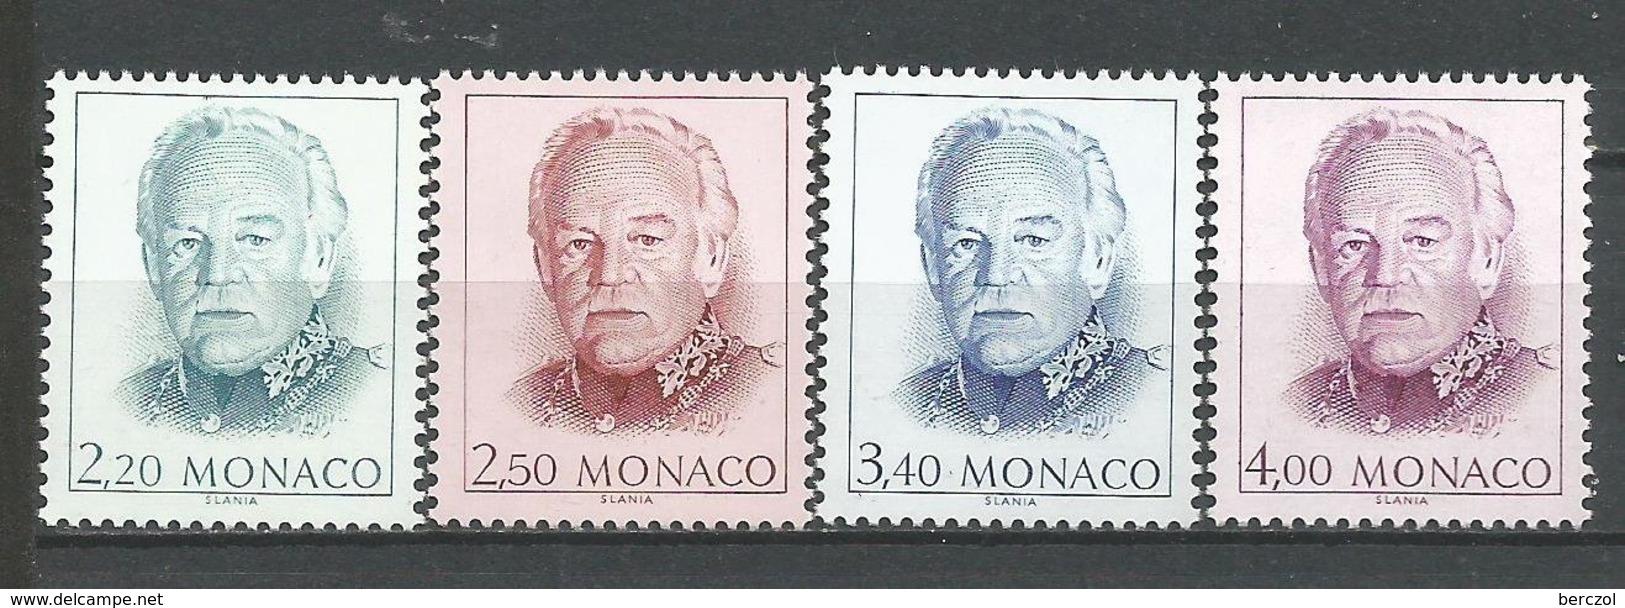 MONACO ANNEE 1991 N° 1779 A 1782 NEUFS** NMH - Monaco